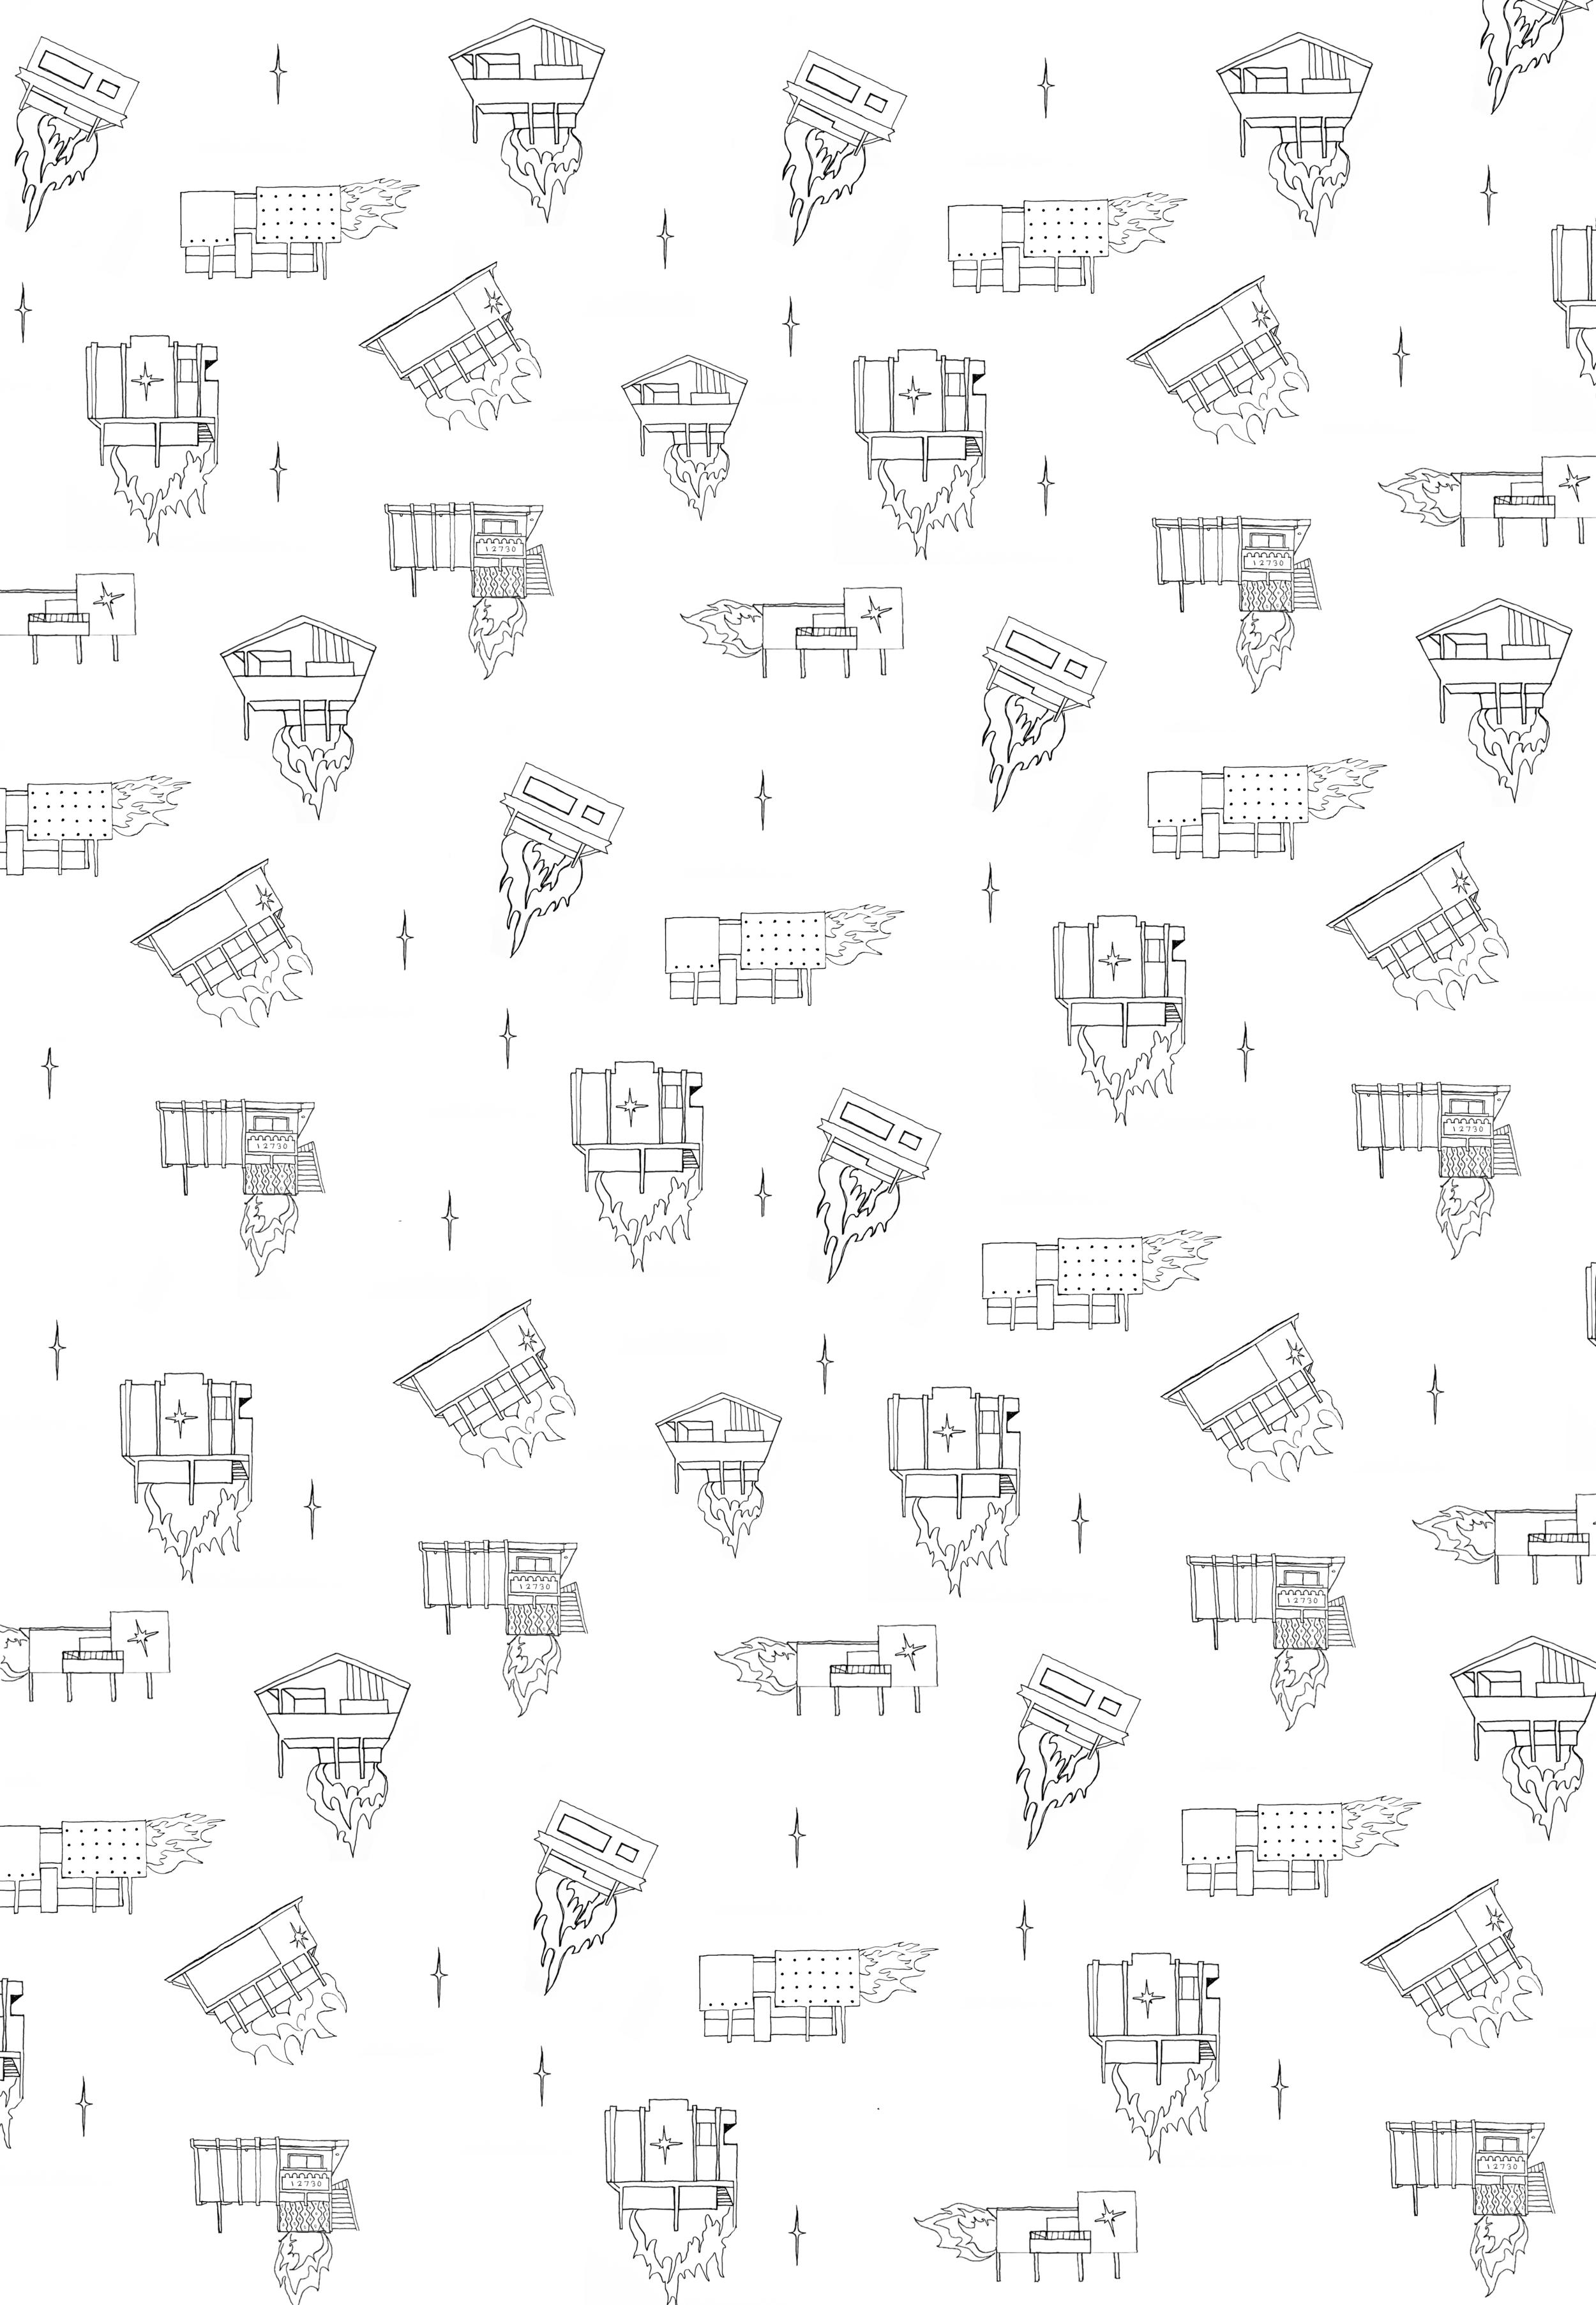 jbellzamy_dingbats_pattern.png